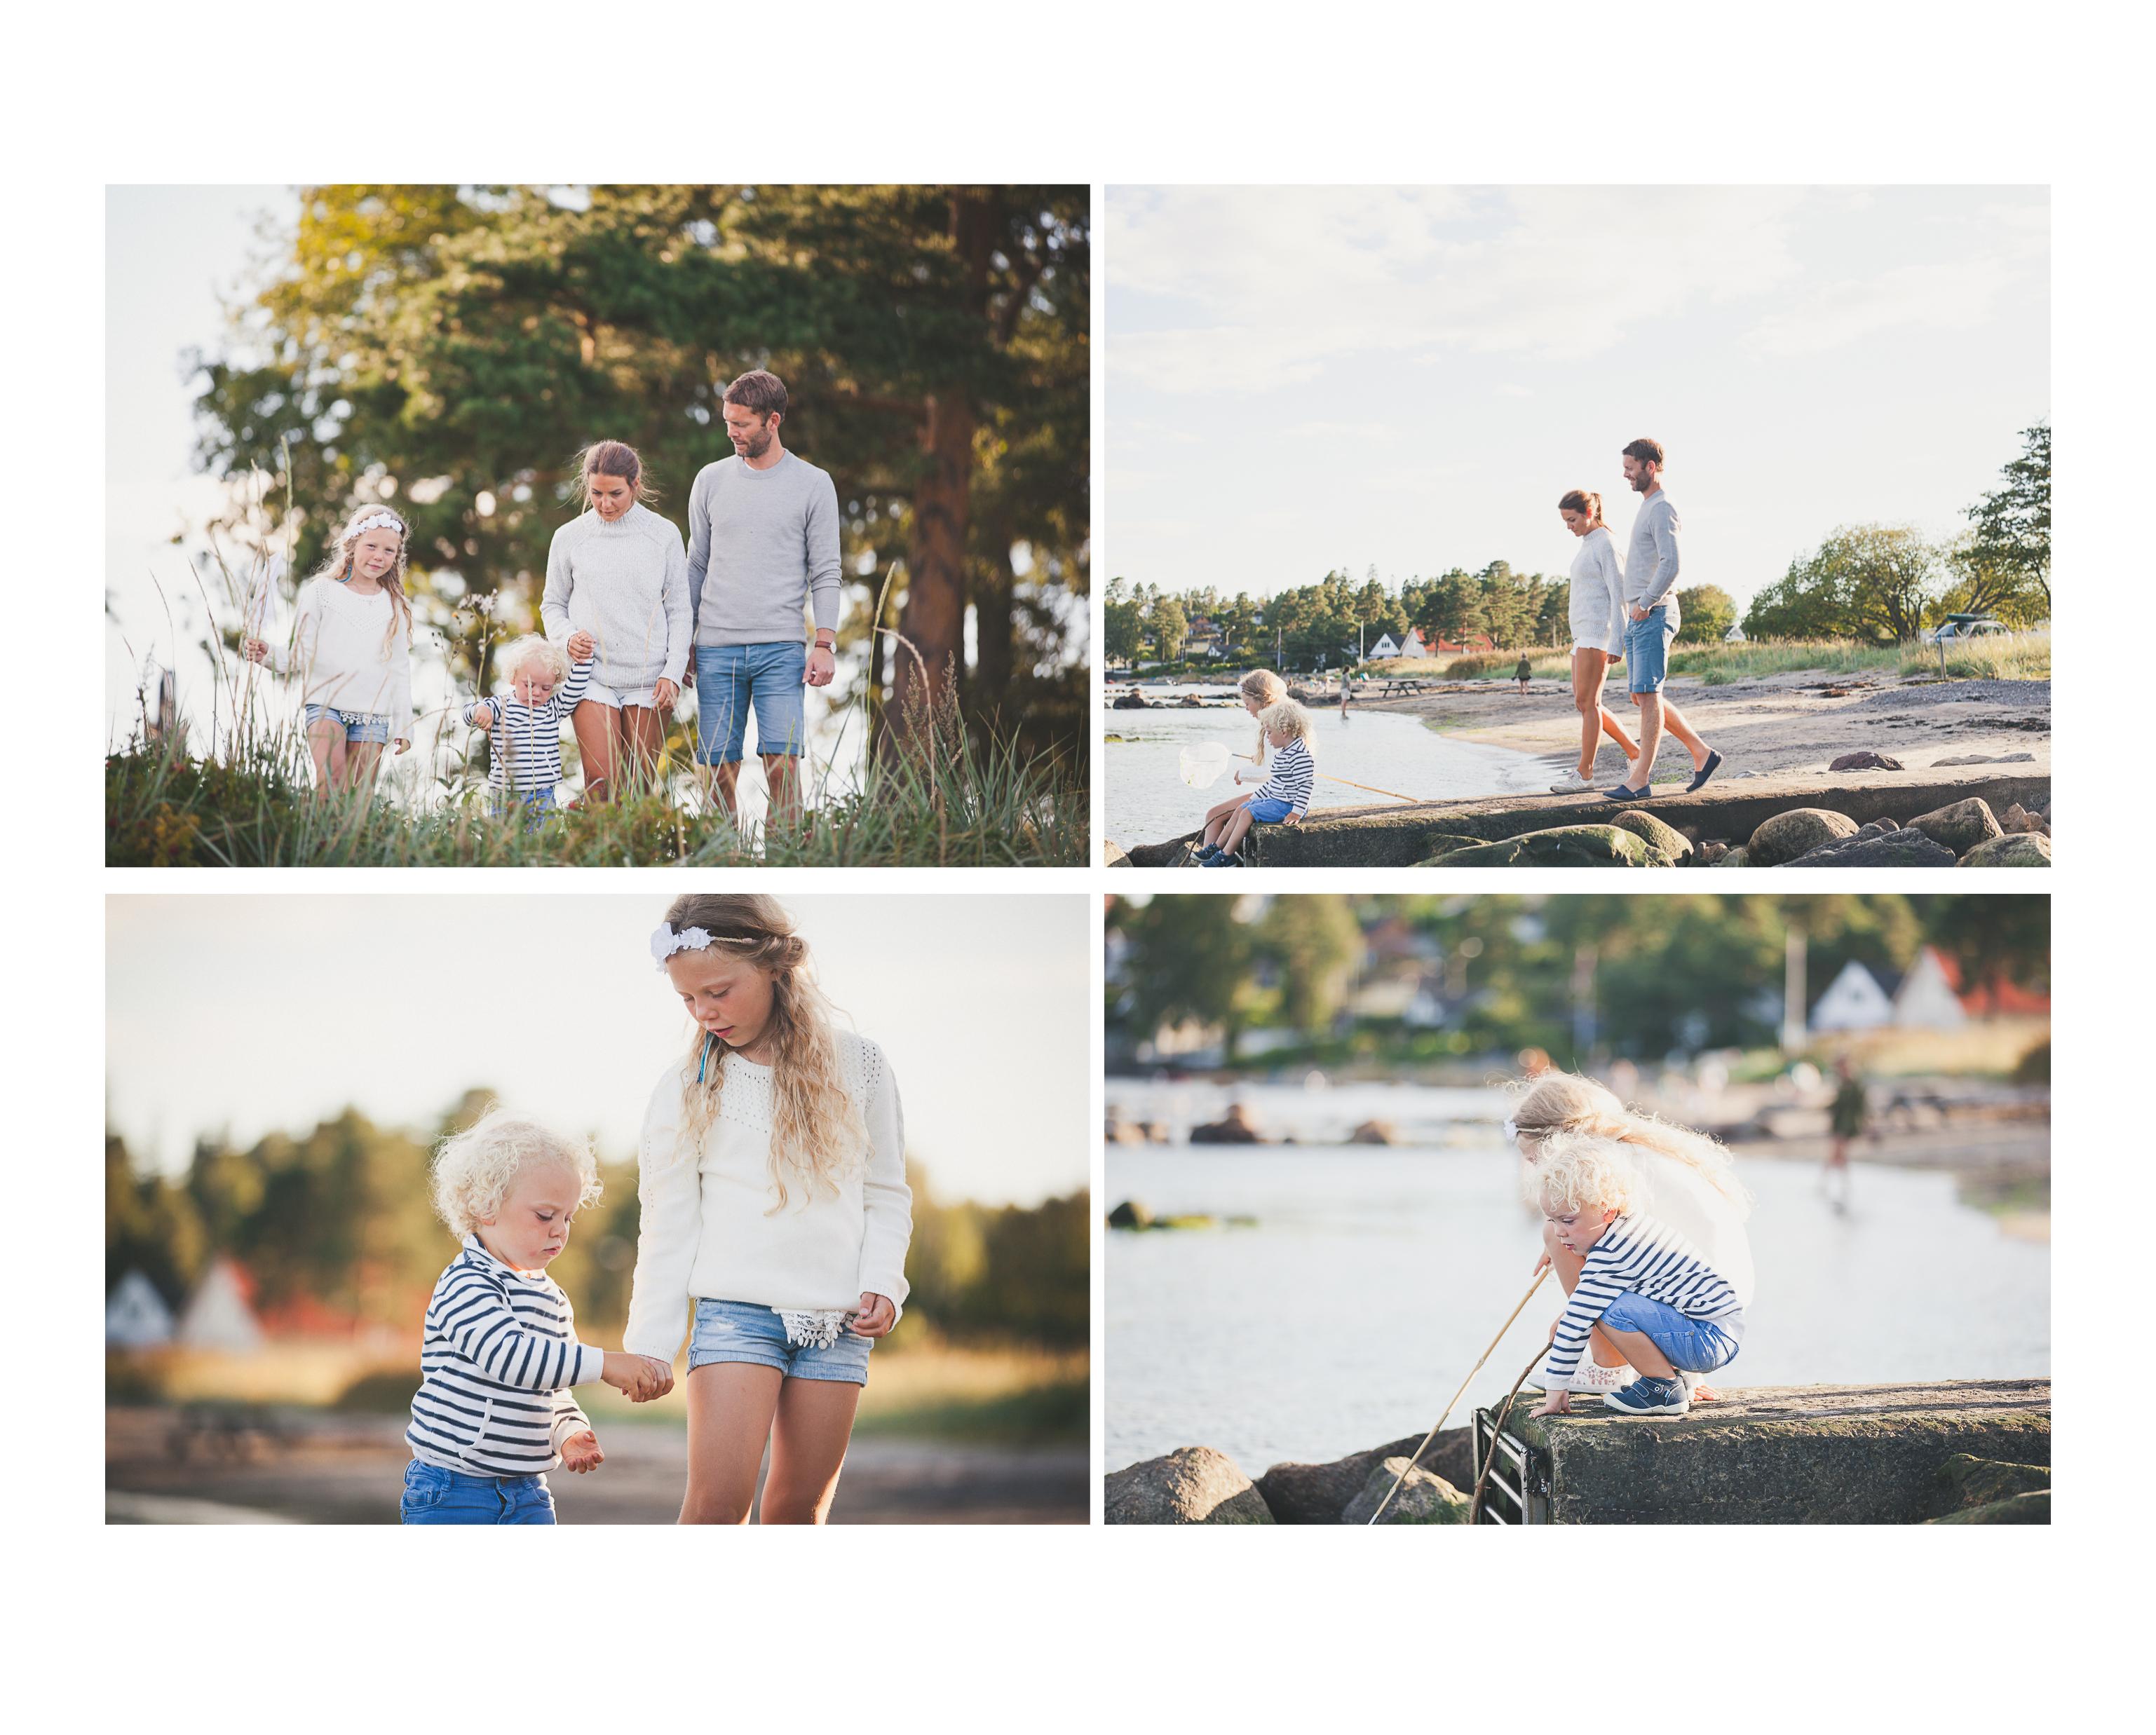 fotograftanjamyrbratenfamilie6